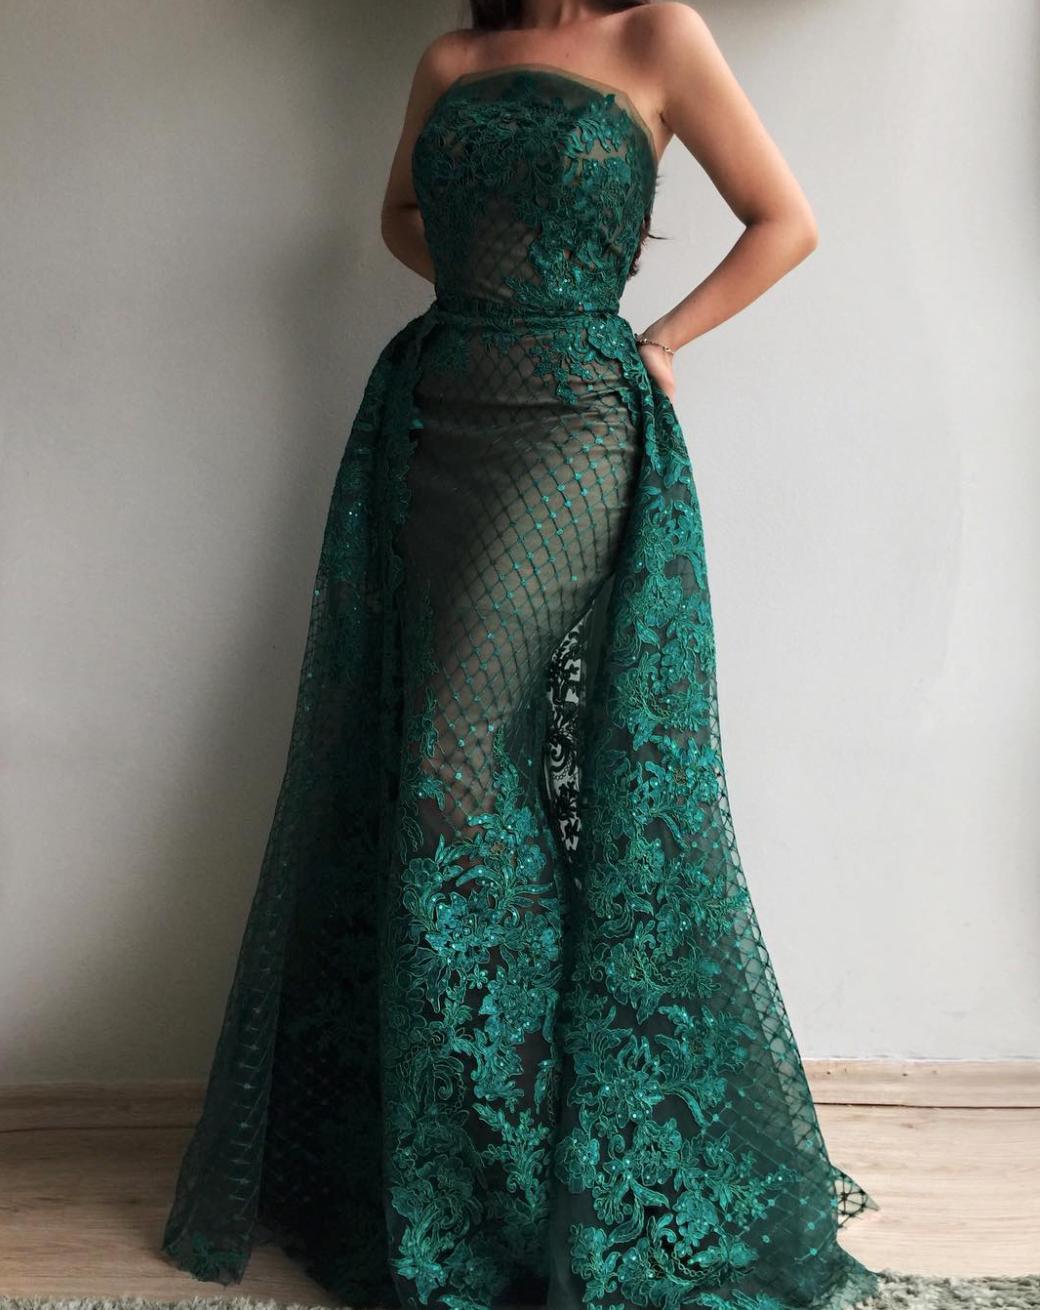 Veridian Mermaid Dress Dinner Gowns Prom Dresses Long Prom Dresses [ 1310 x 1040 Pixel ]